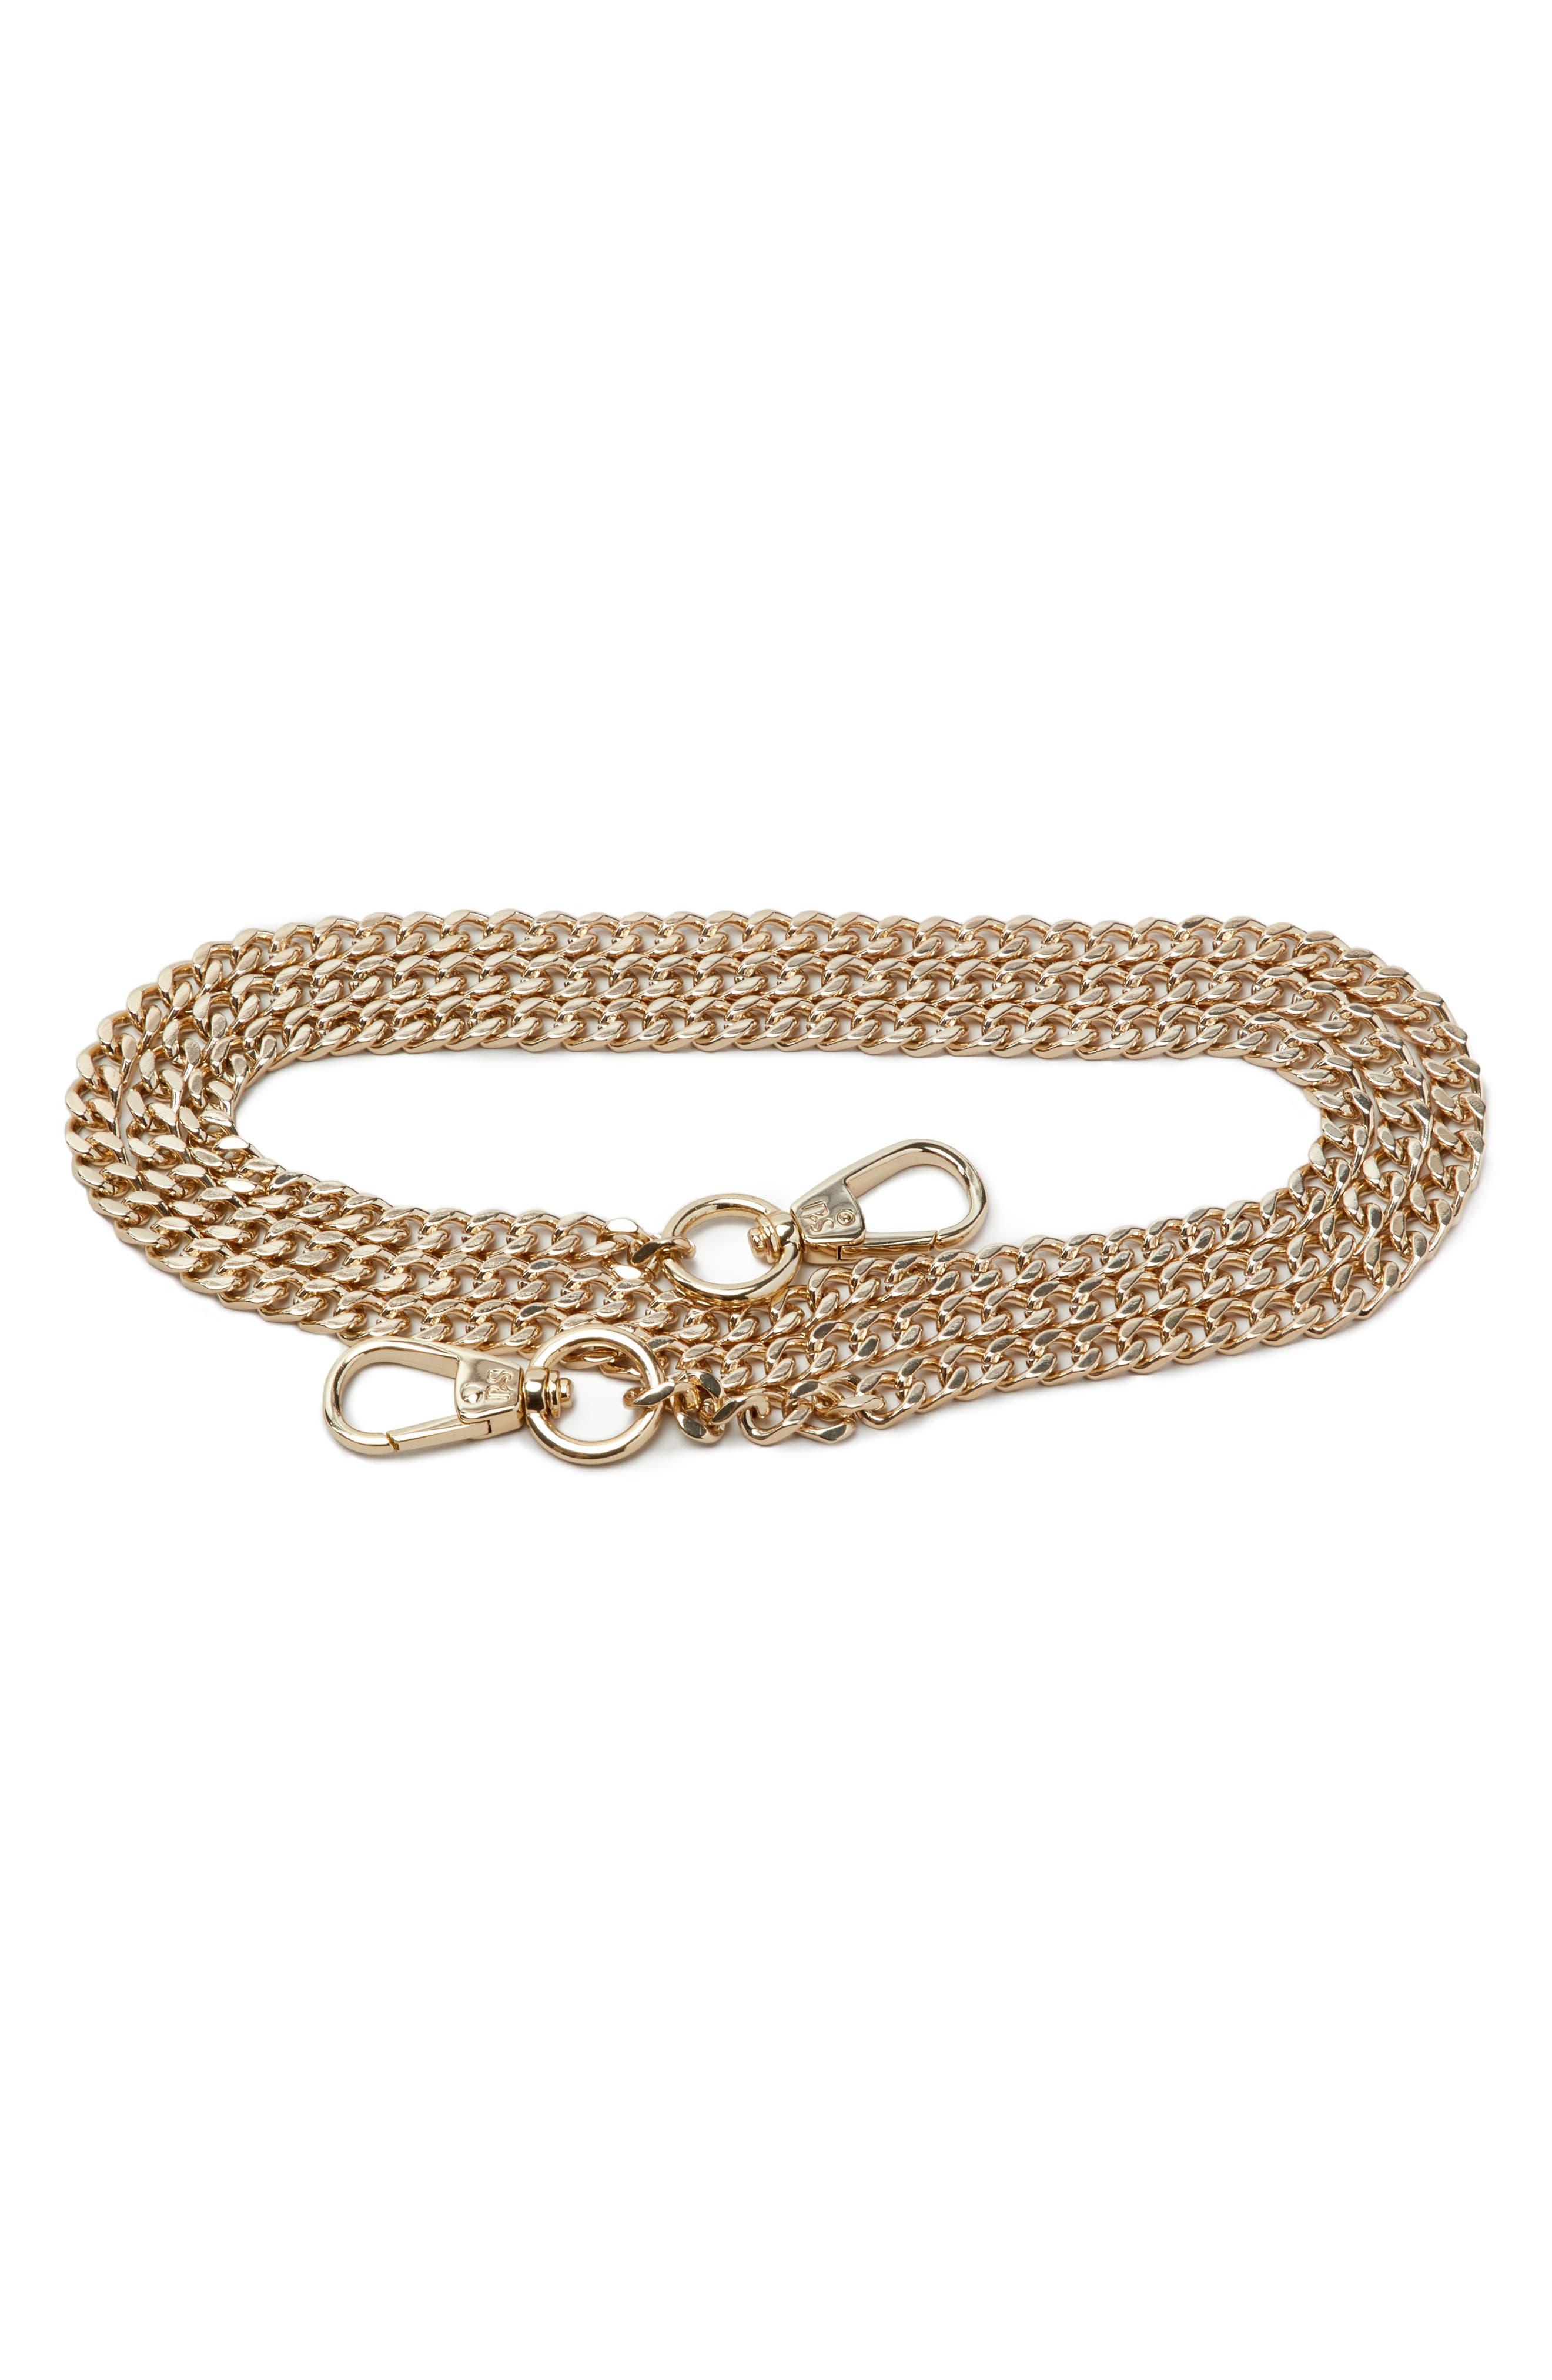 Chain Shoulder Strap,                             Main thumbnail 1, color,                             Gold